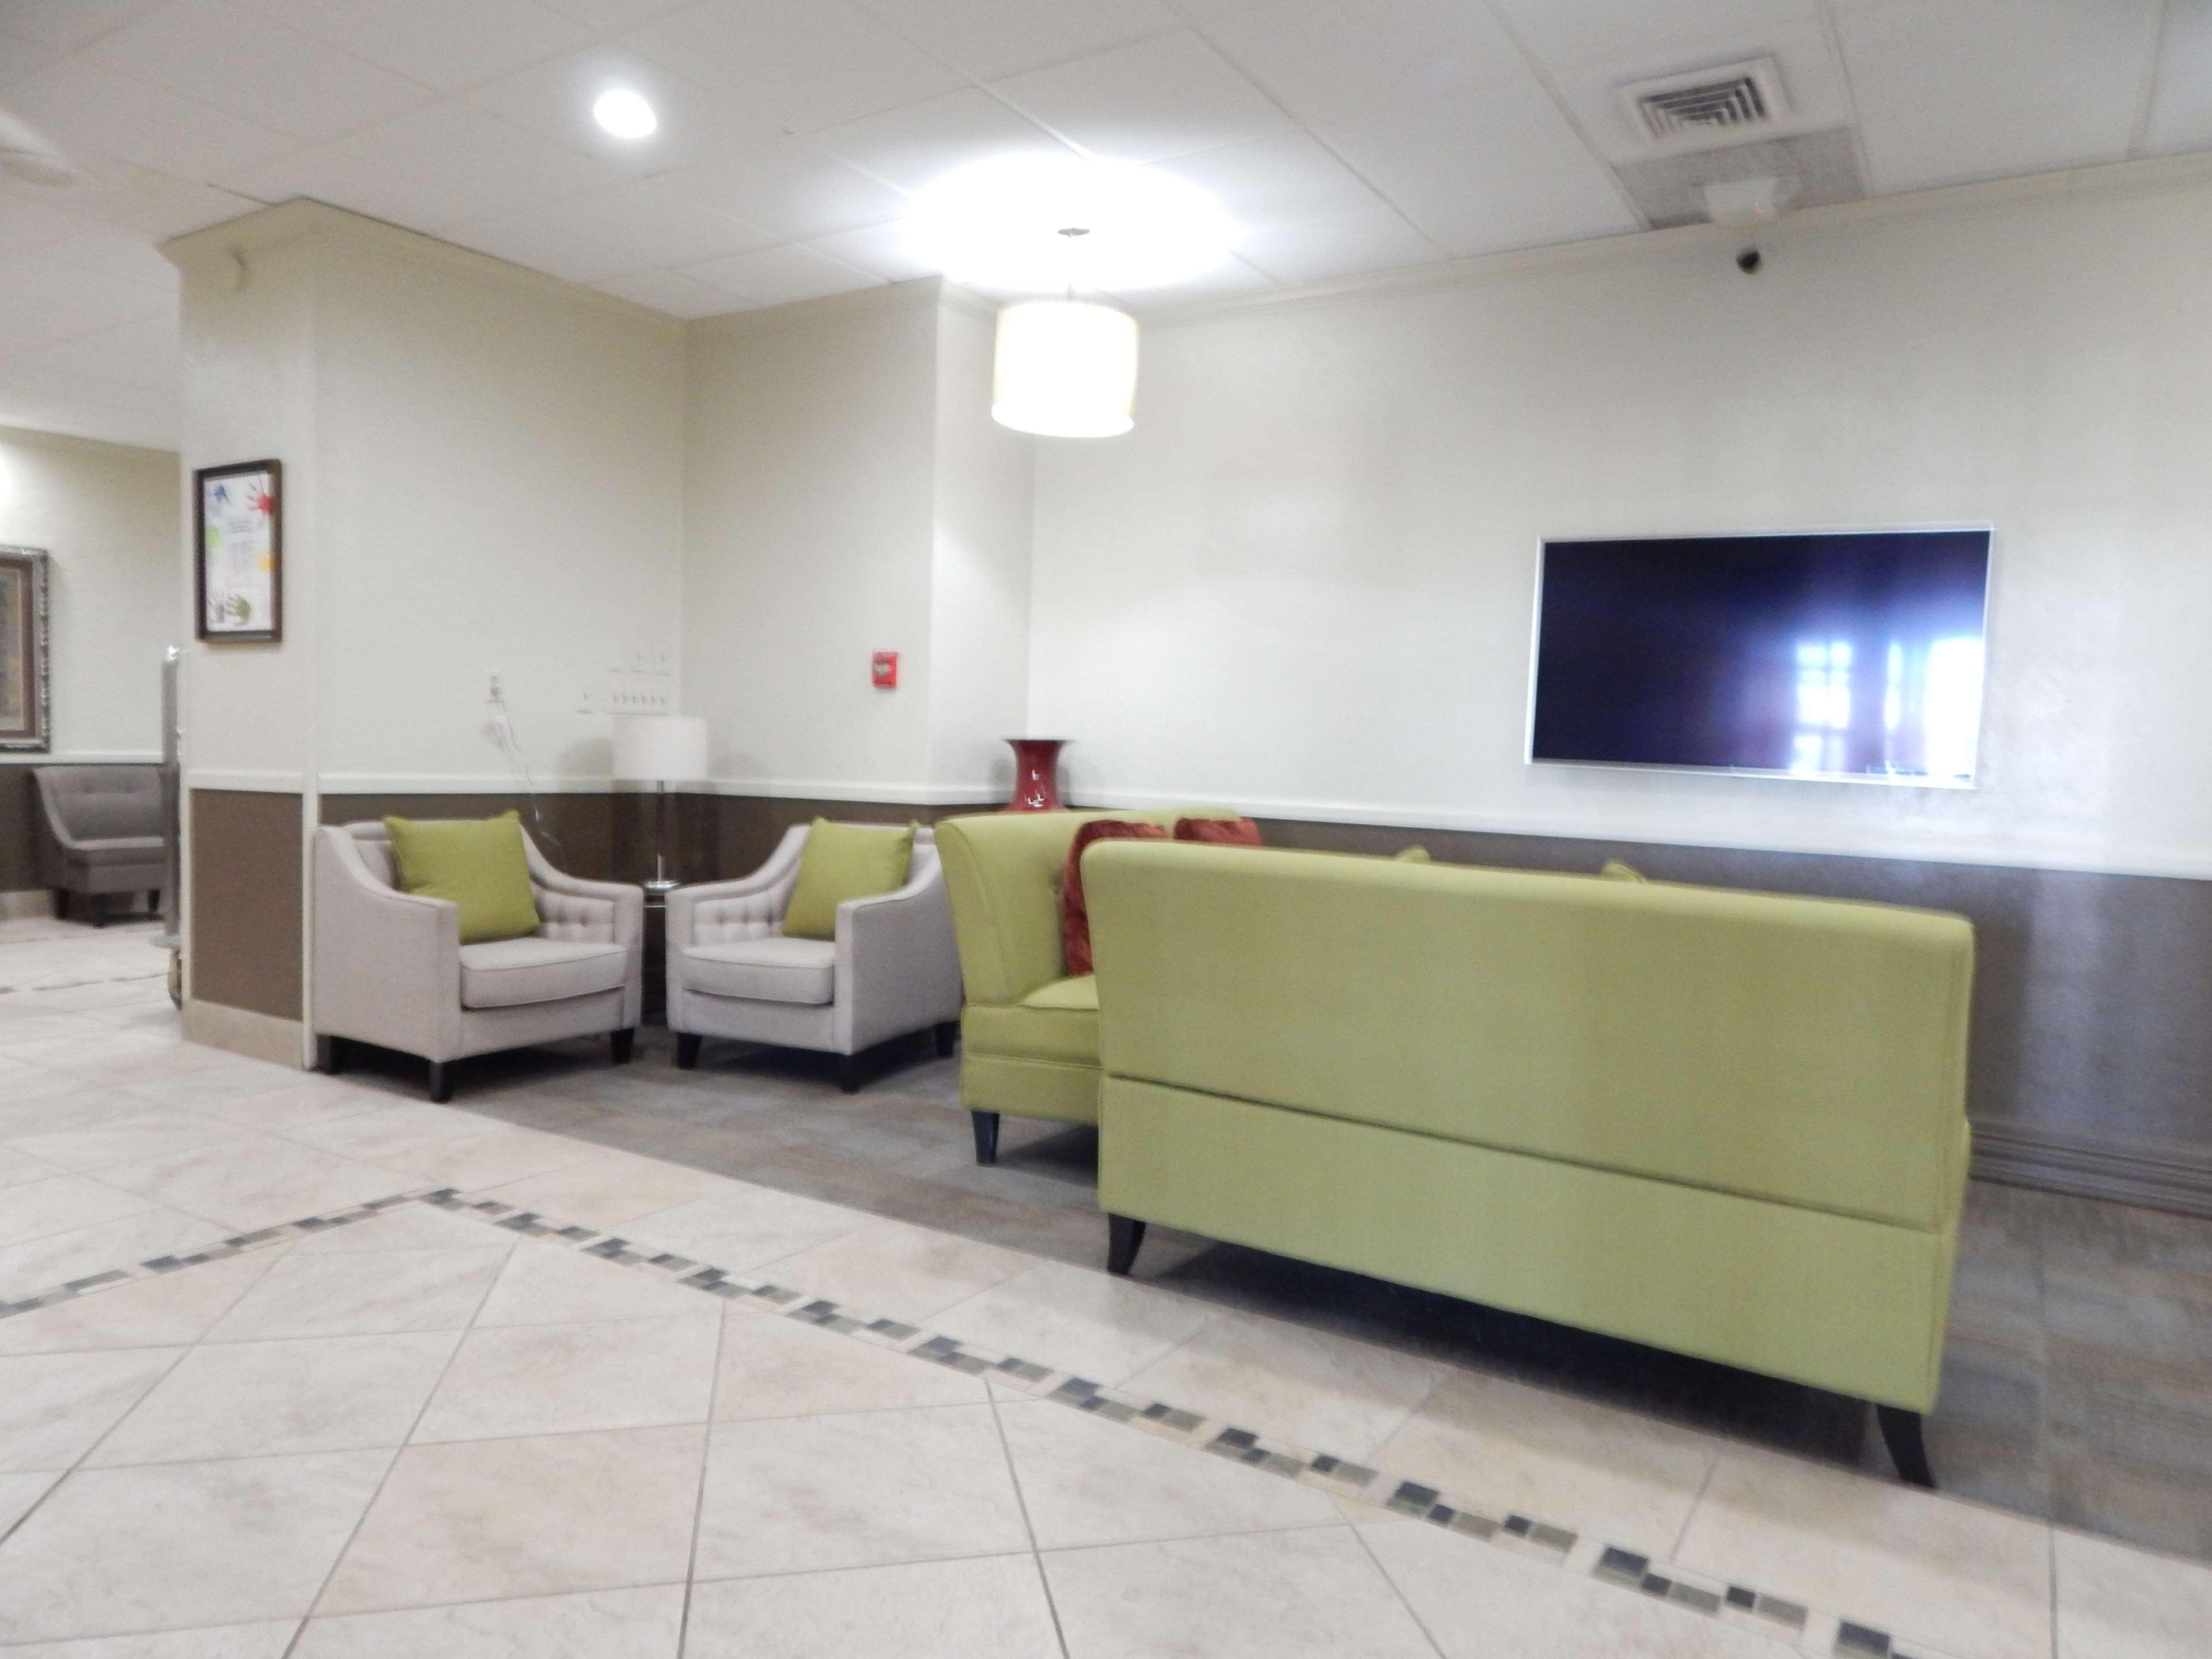 Best Western Plus Lawton Hotel & Convention Center image 1